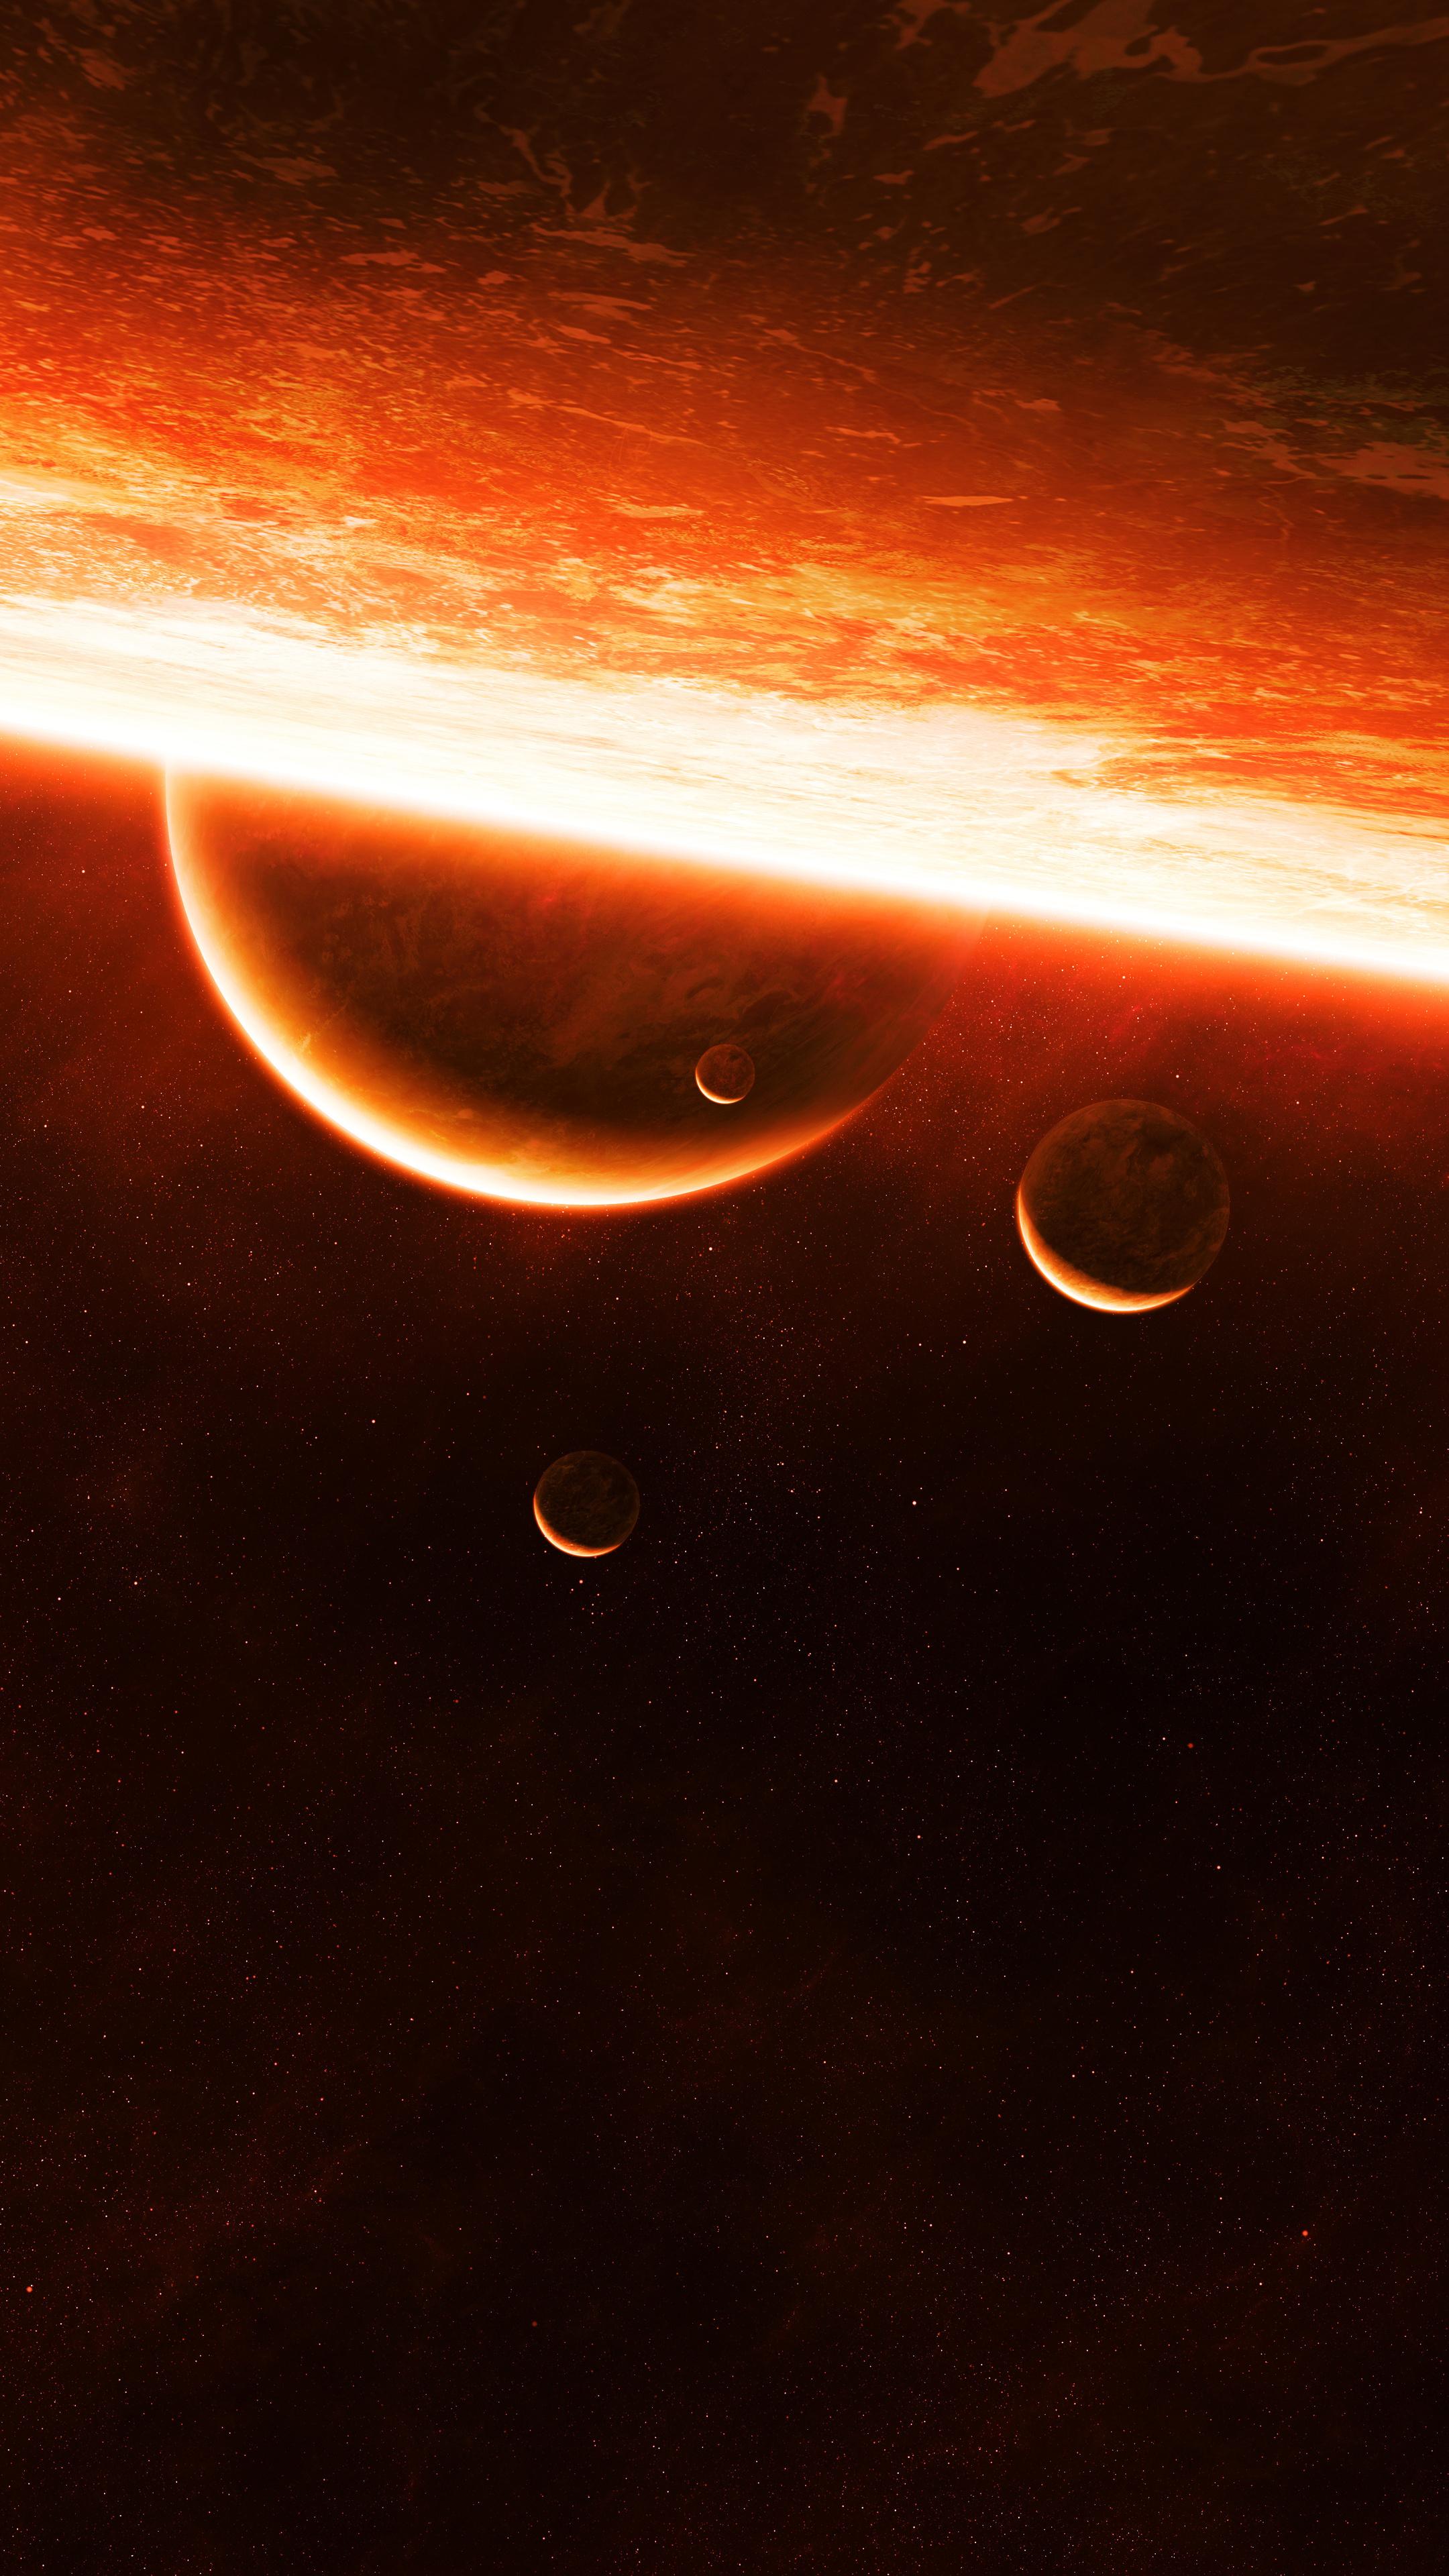 planet-surface-glow-8k-9m.jpg